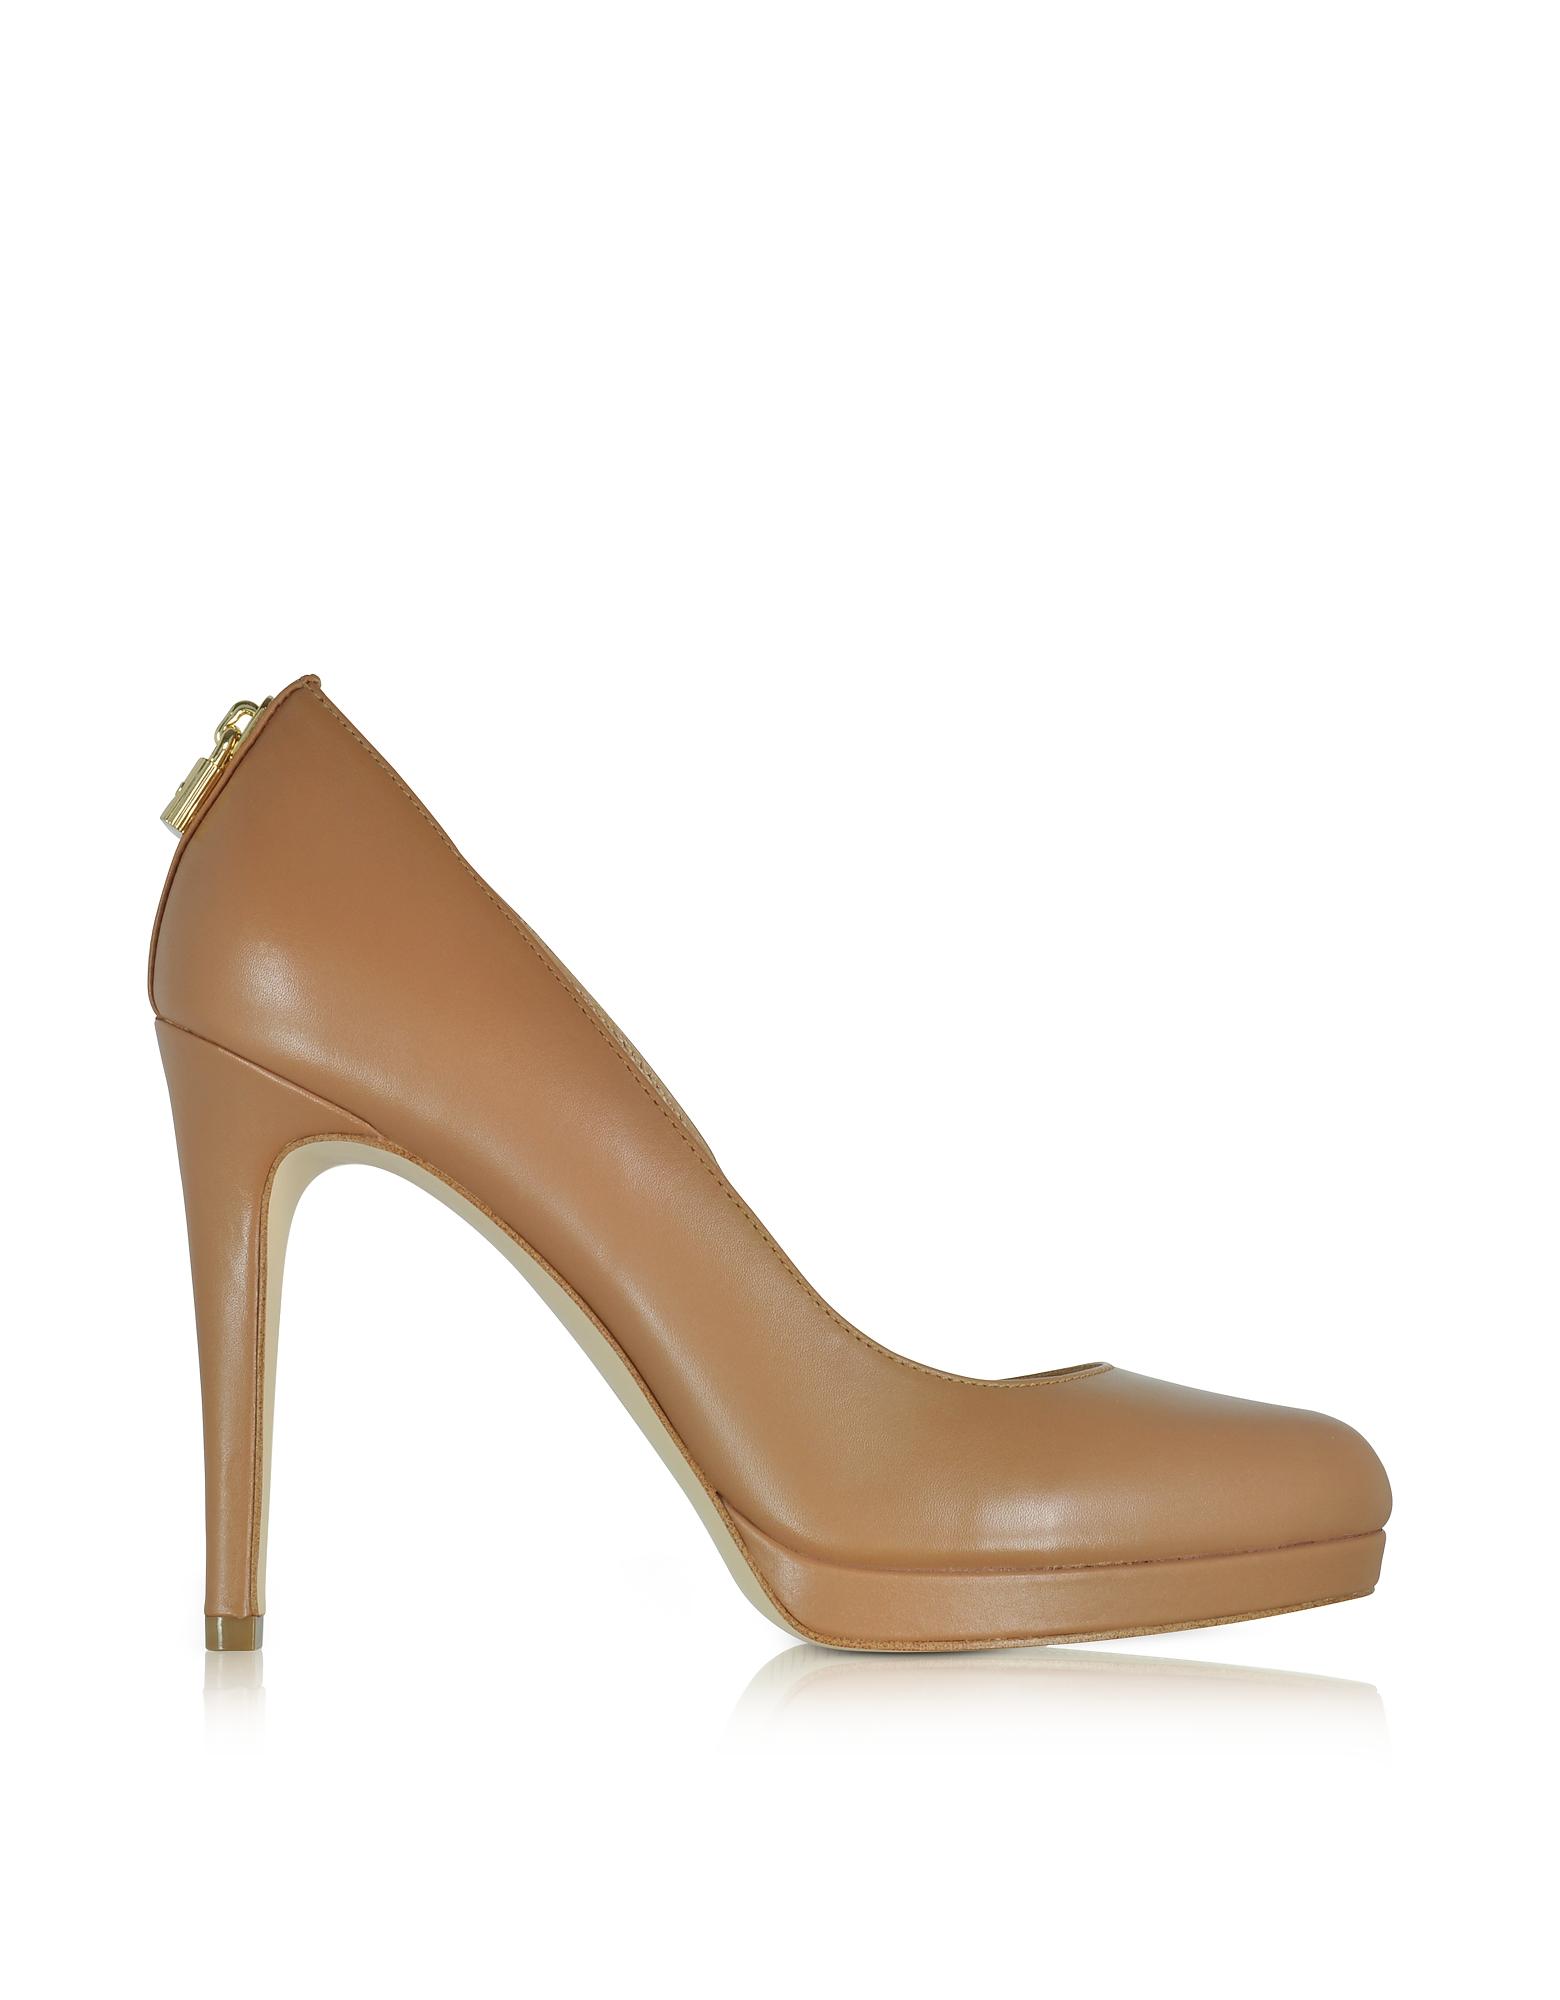 Michael Kors Shoes, Antoinette Acorn Leather Heel Pumps